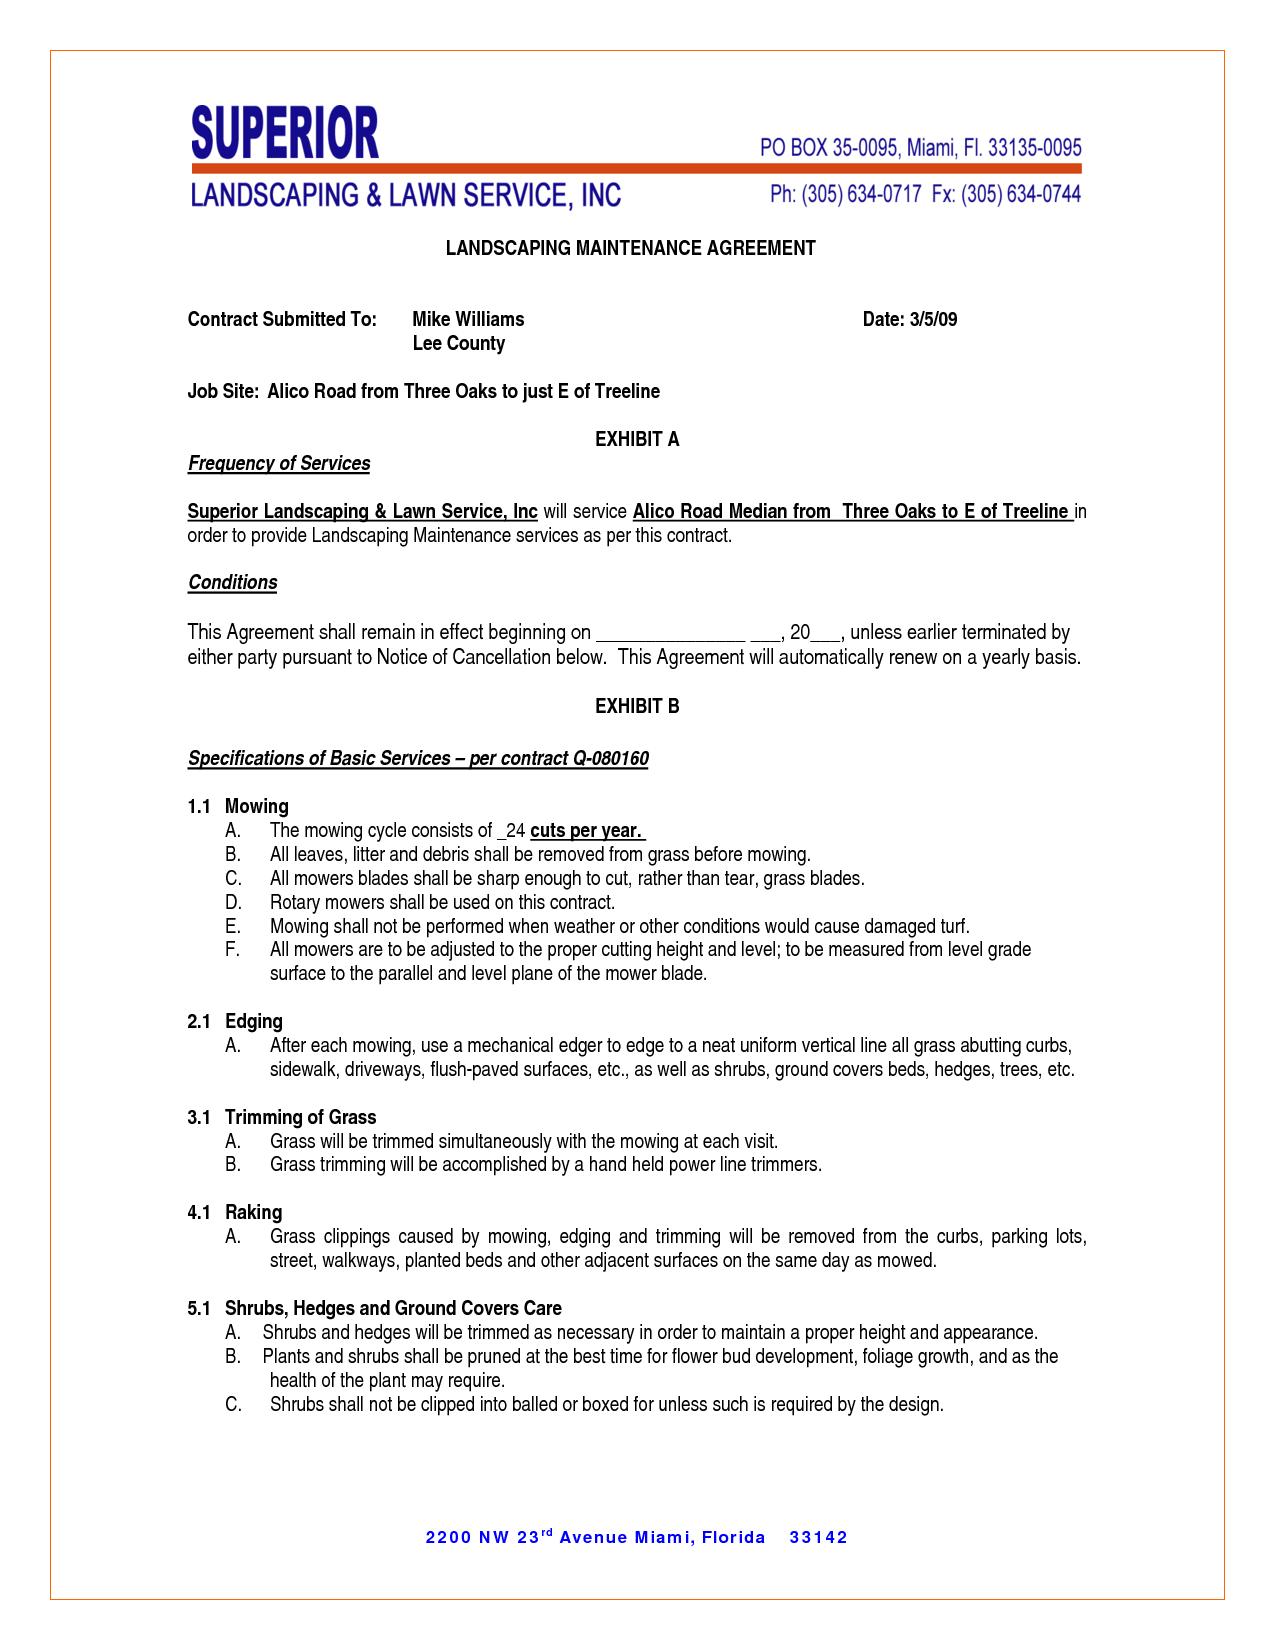 maintenance contract agreement | landscapes | Pinterest | Contract ...